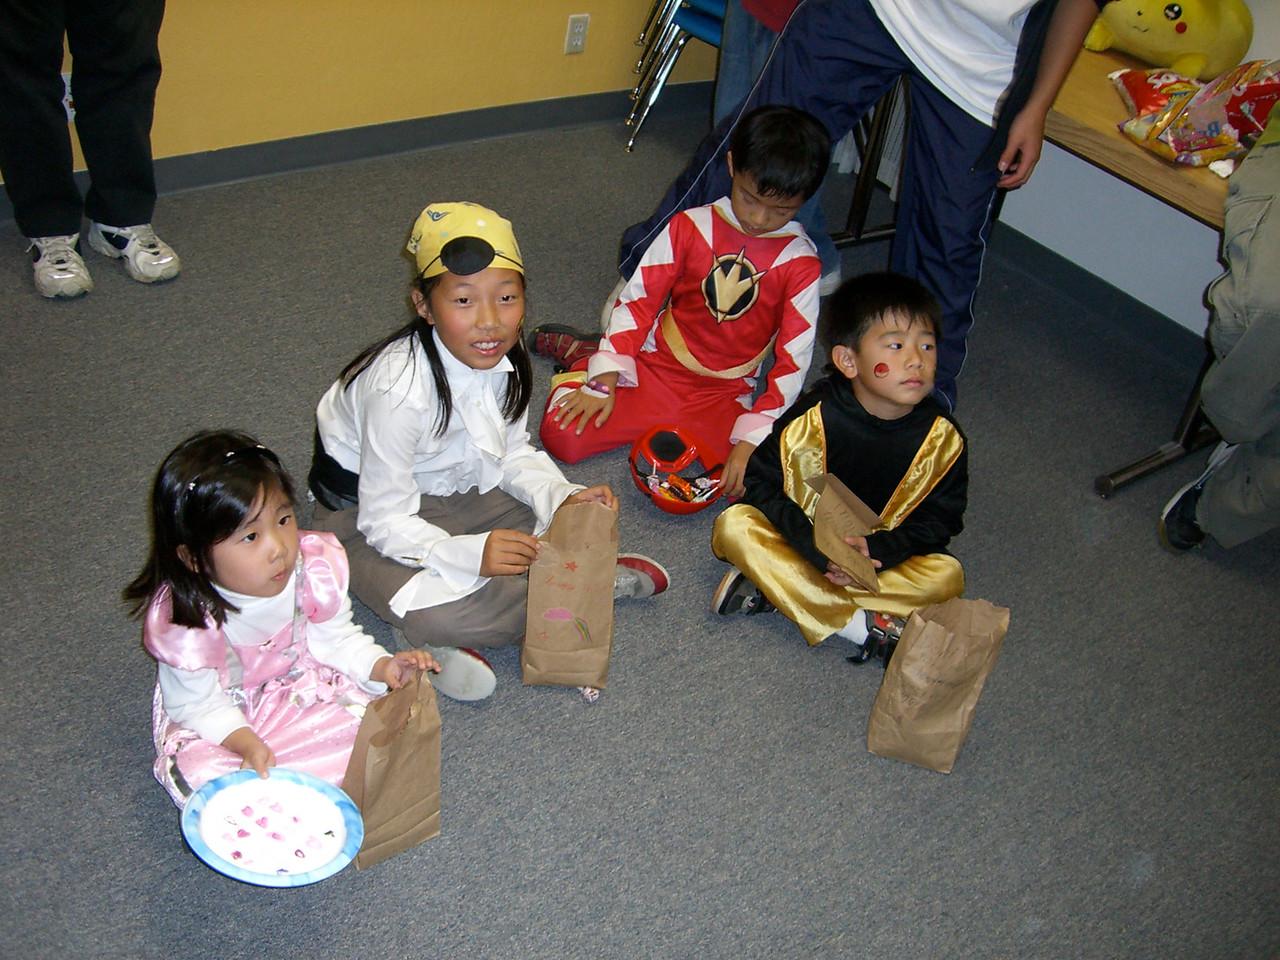 Sugar-free kids play play hangman